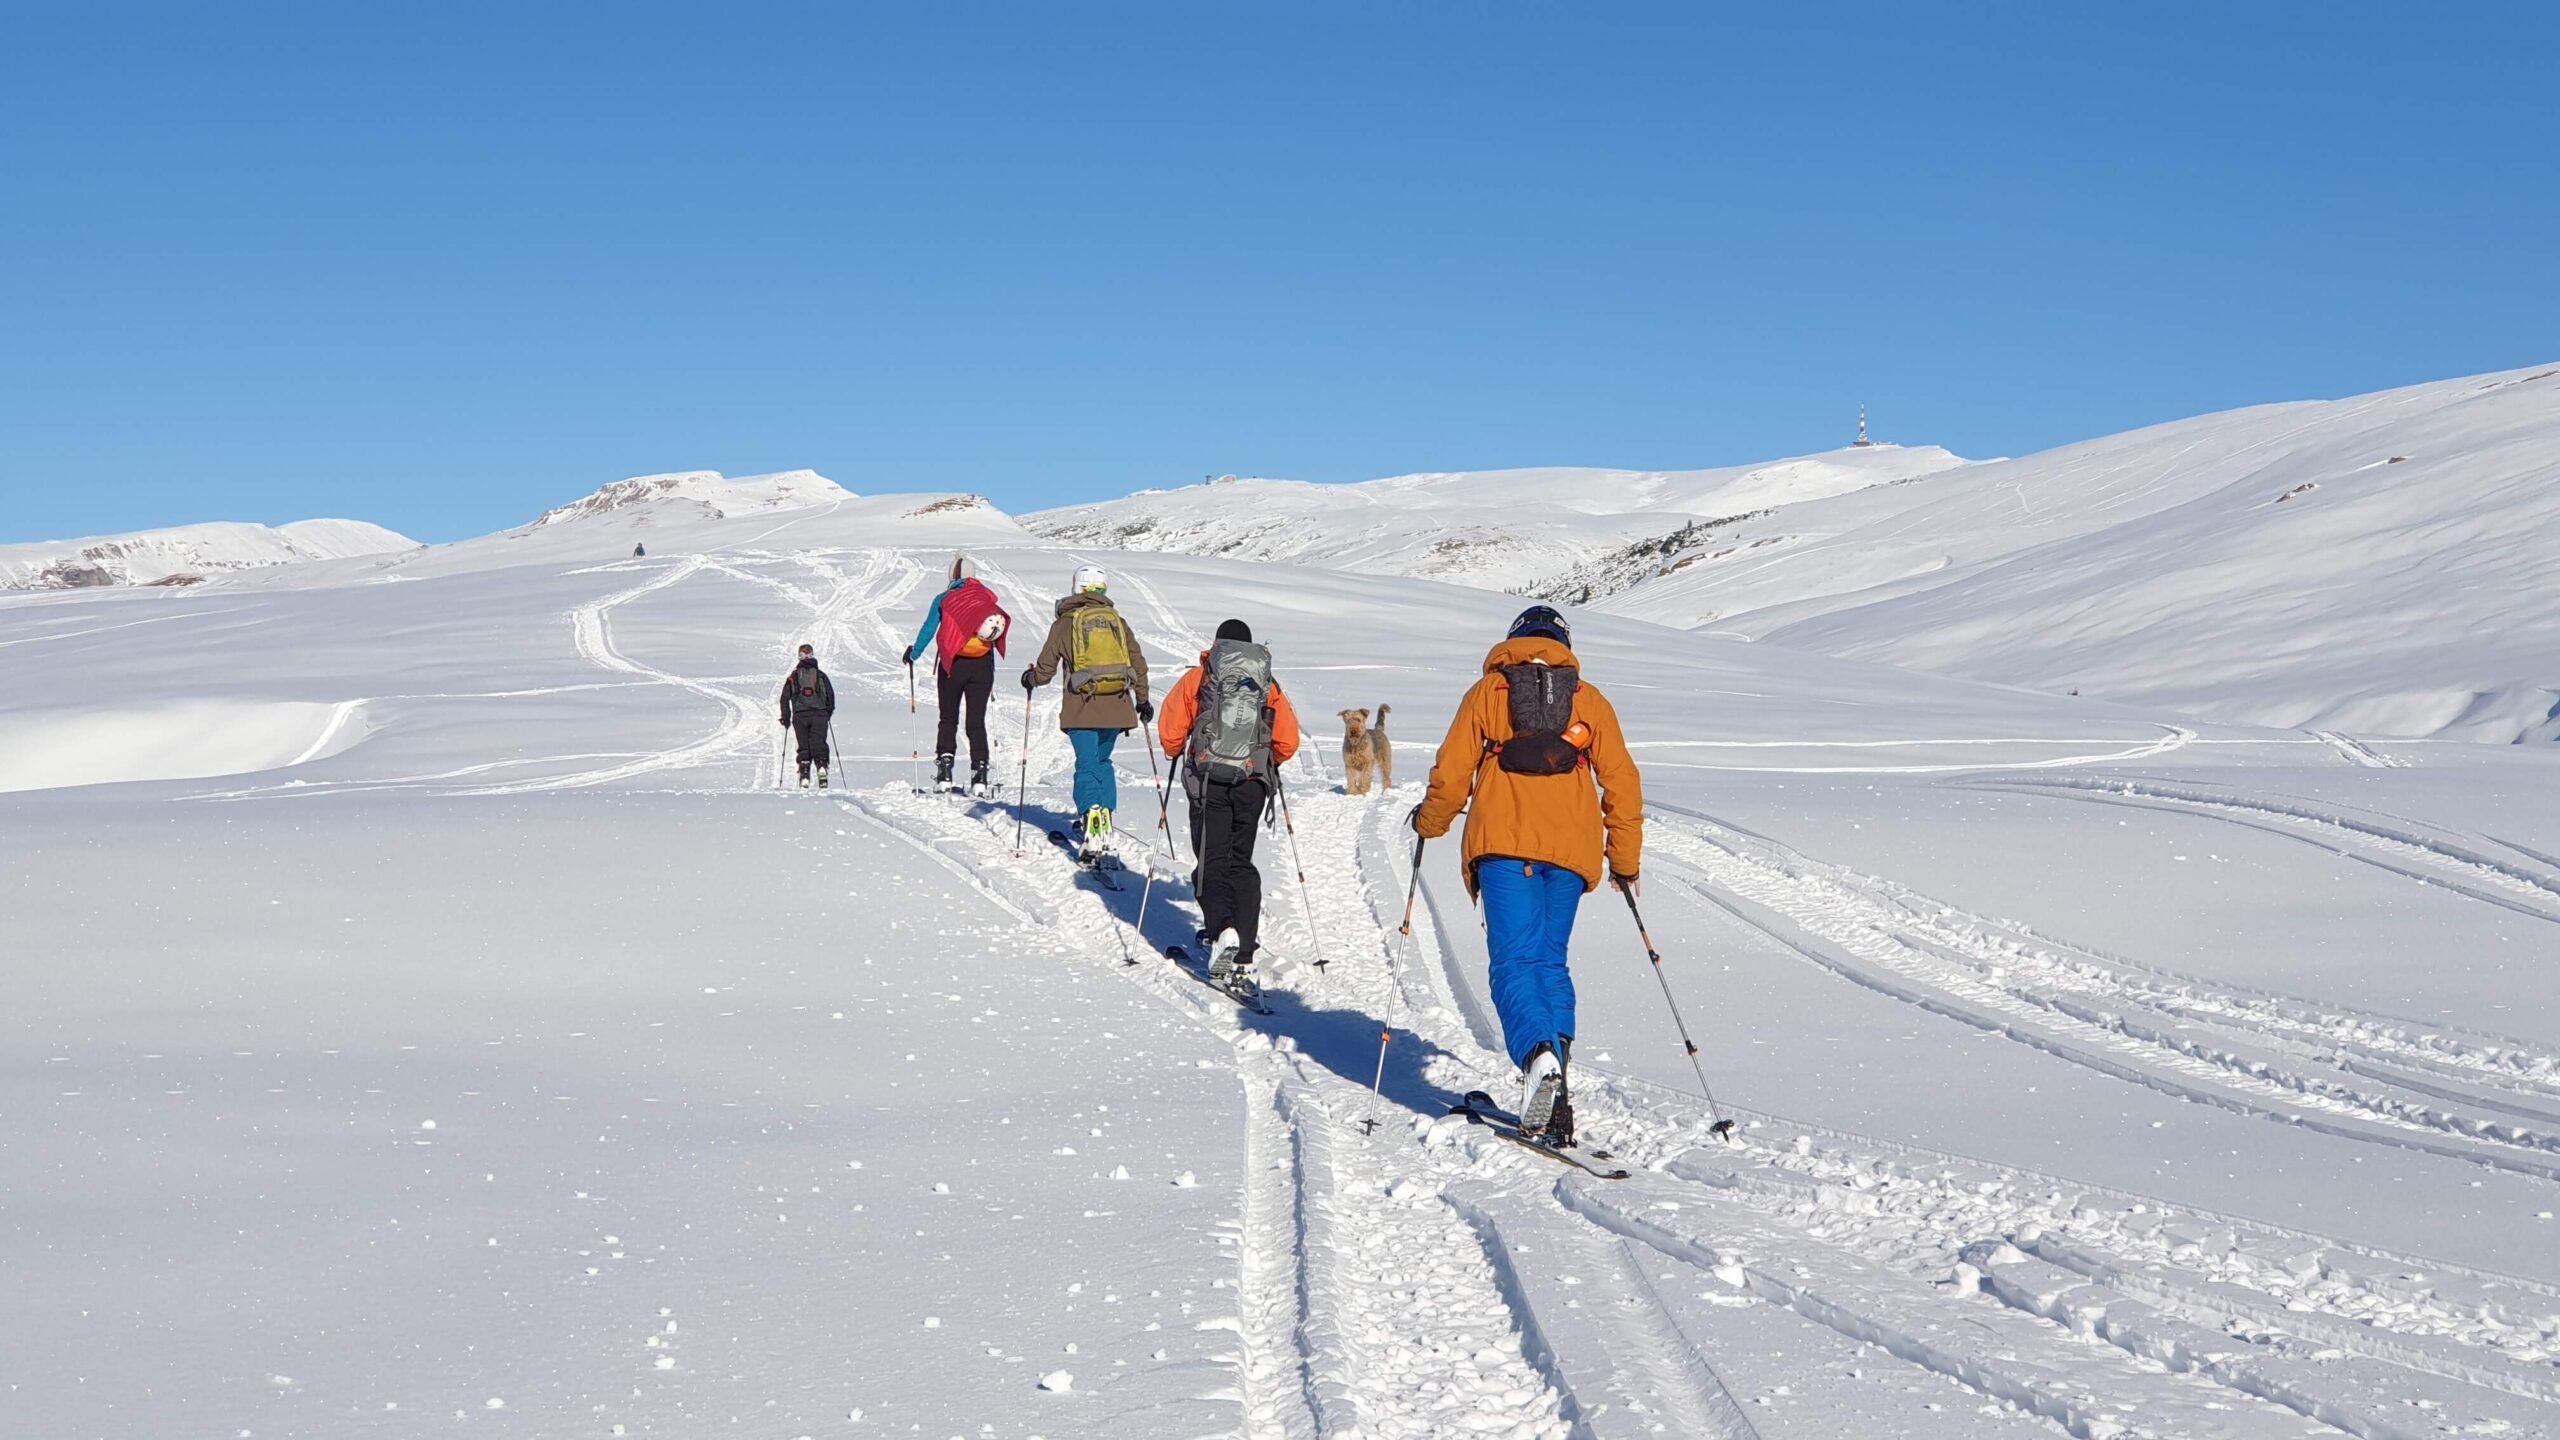 Workshop ski touring.